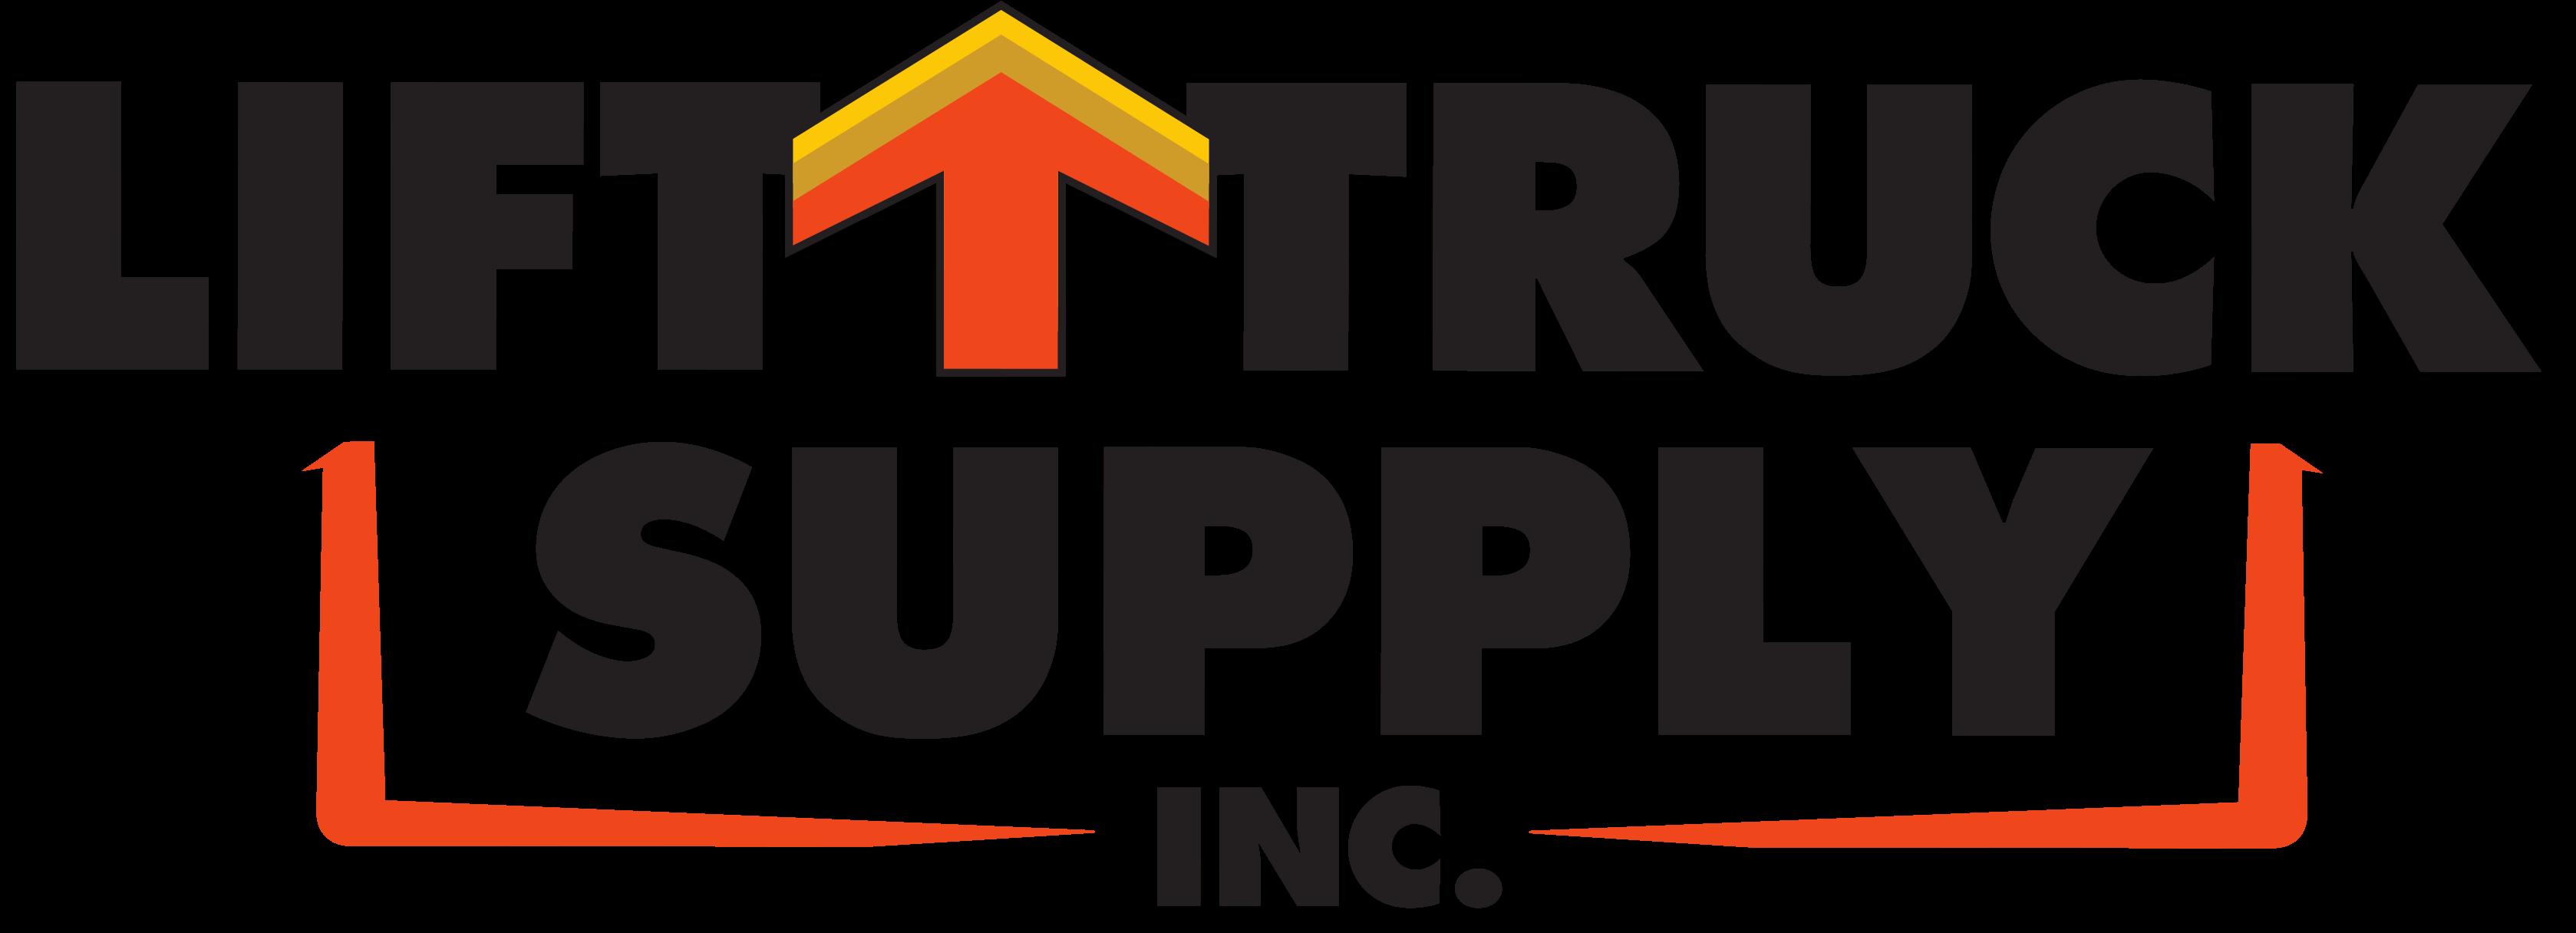 Lift Truck Supply, Inc.